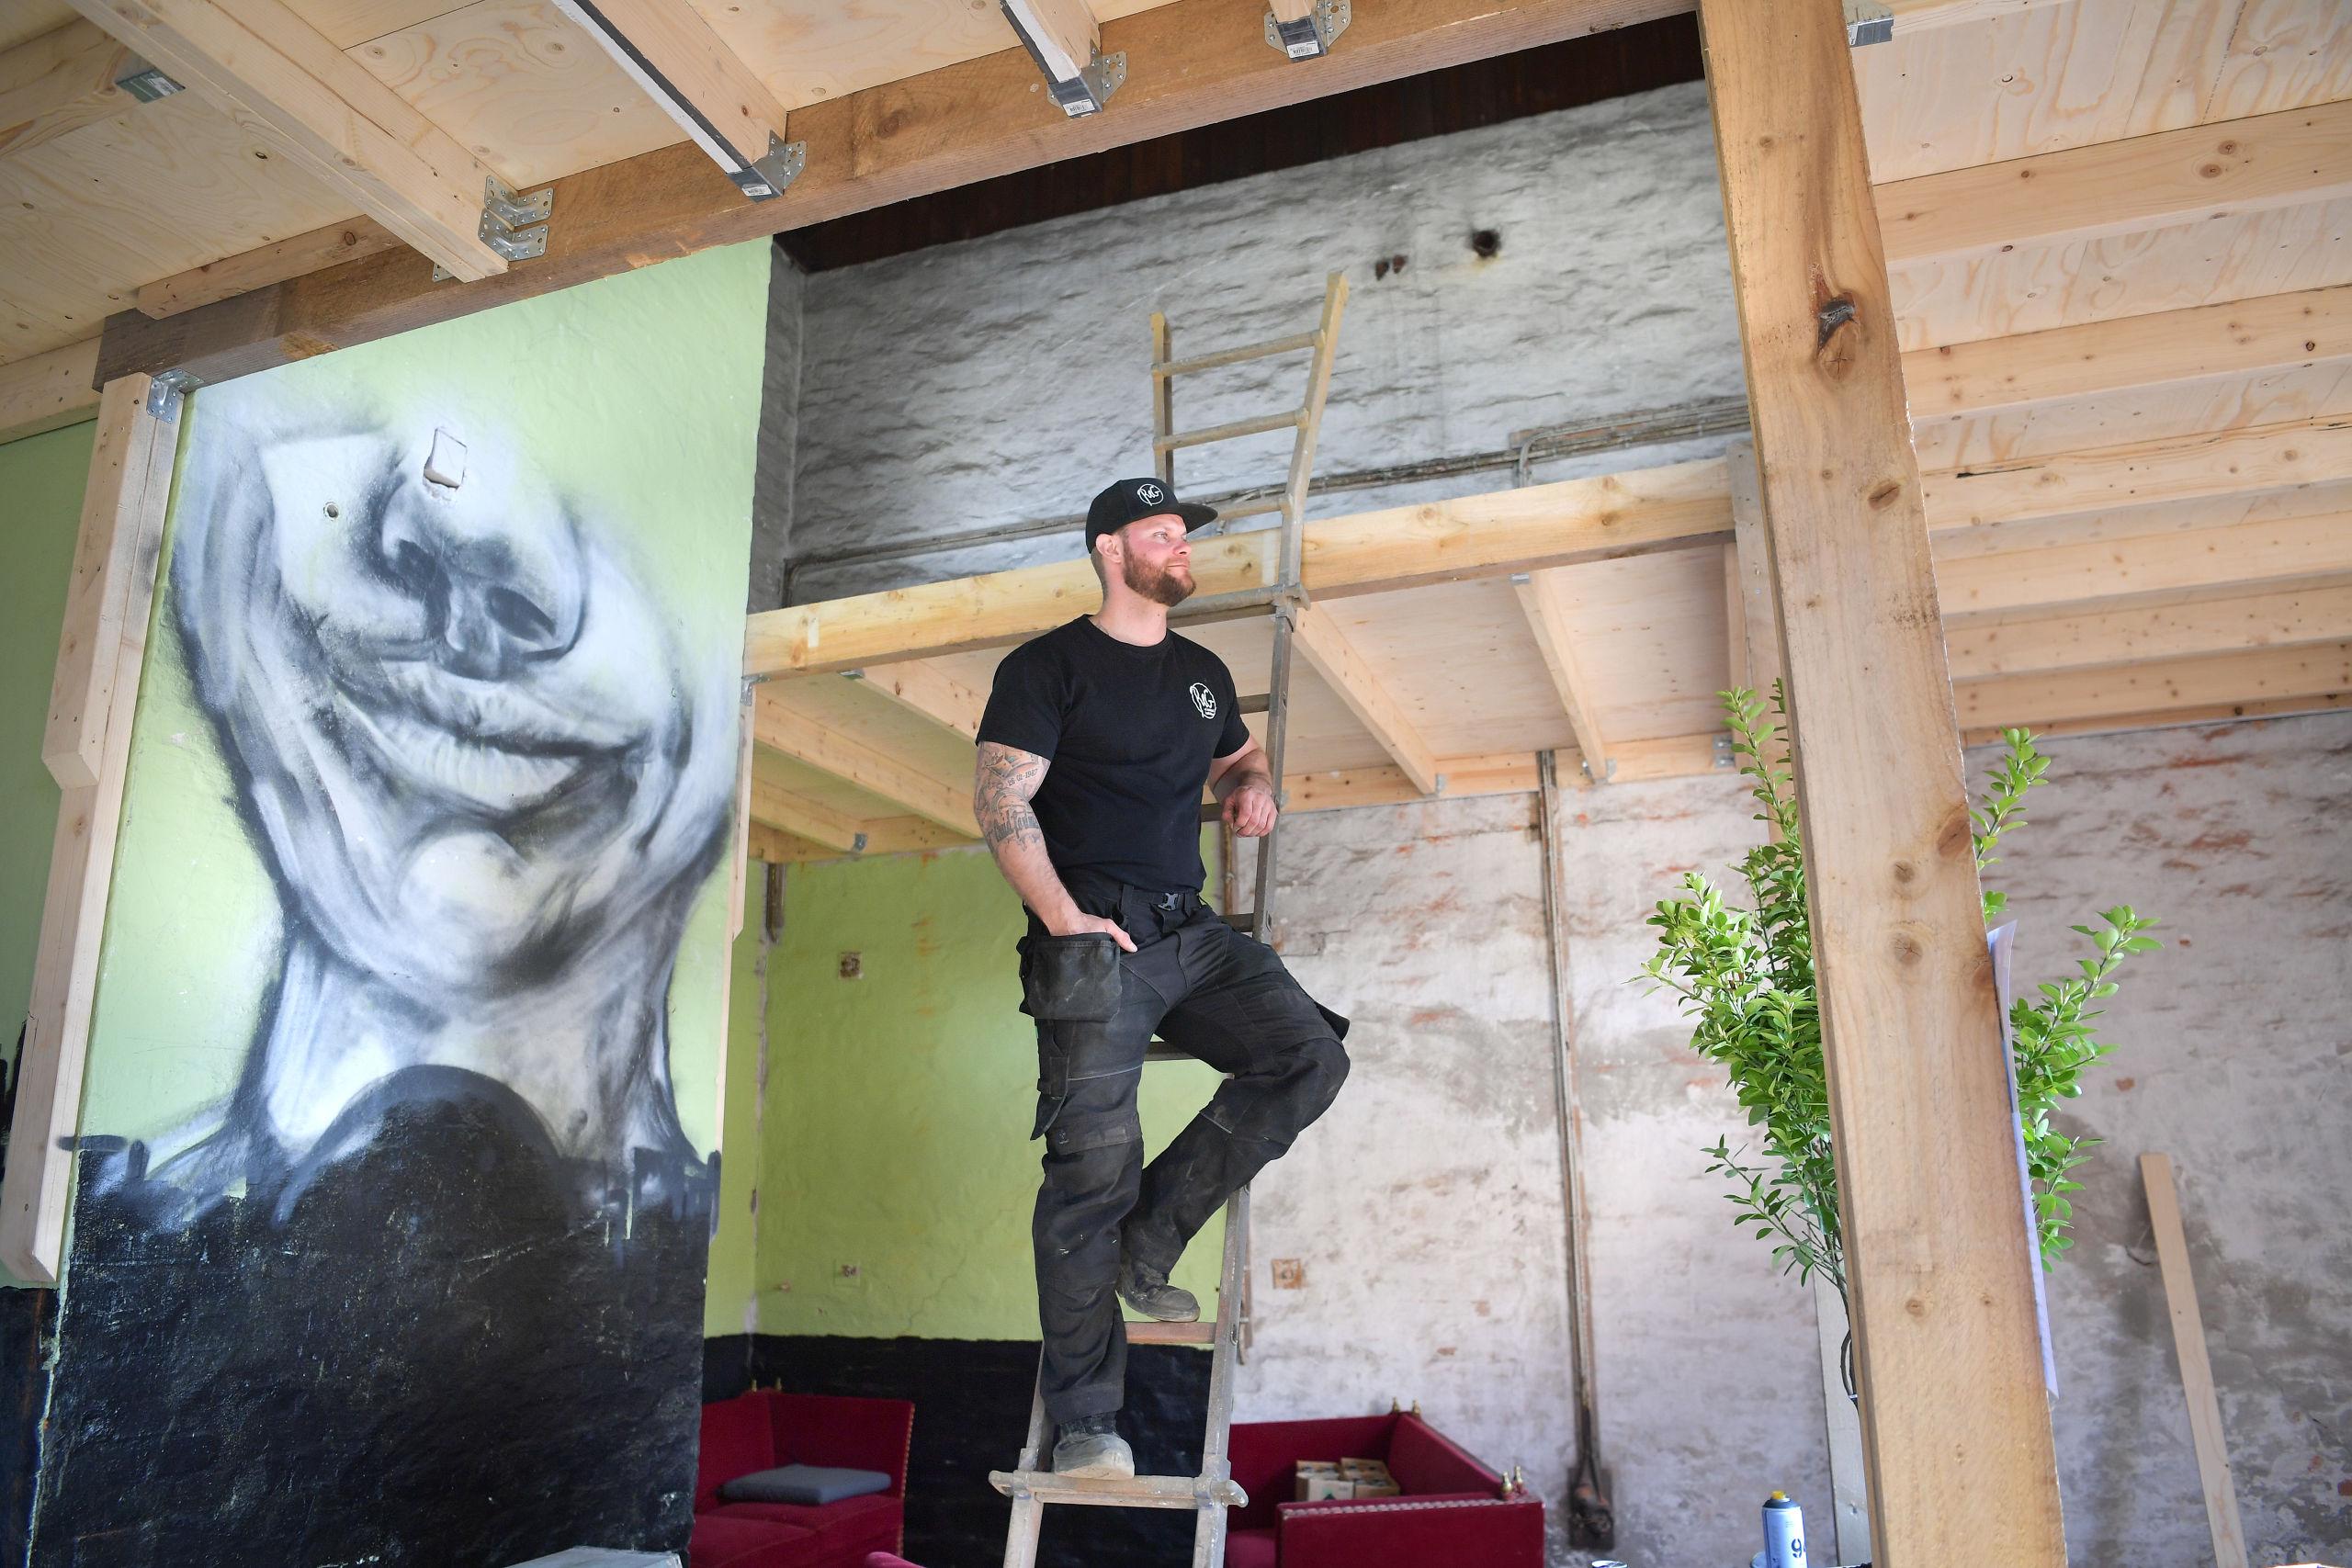 Helt nyt atelier og galleri slår dørene op